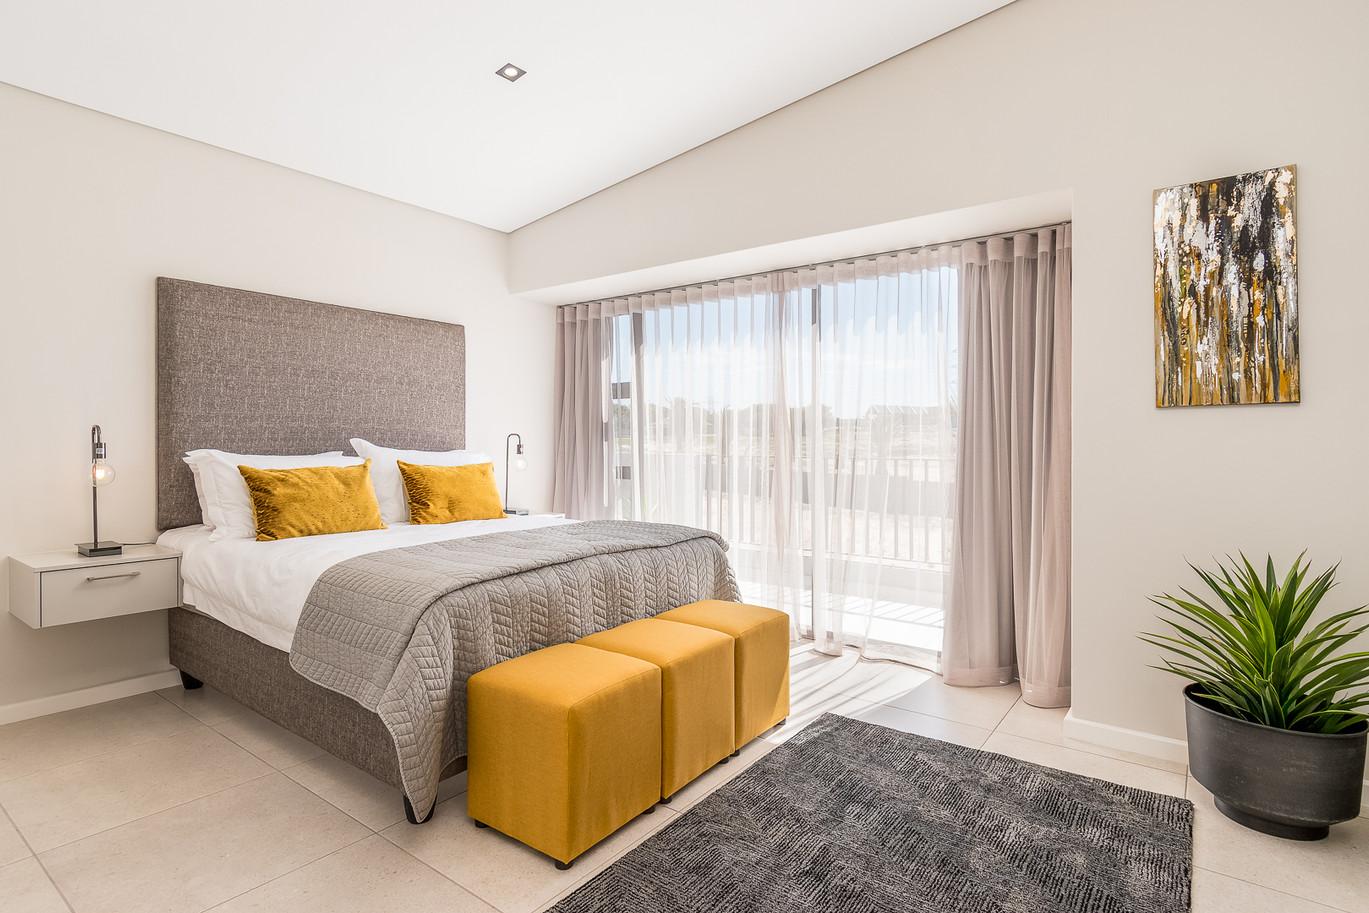 Greystone Master Bedroom 6